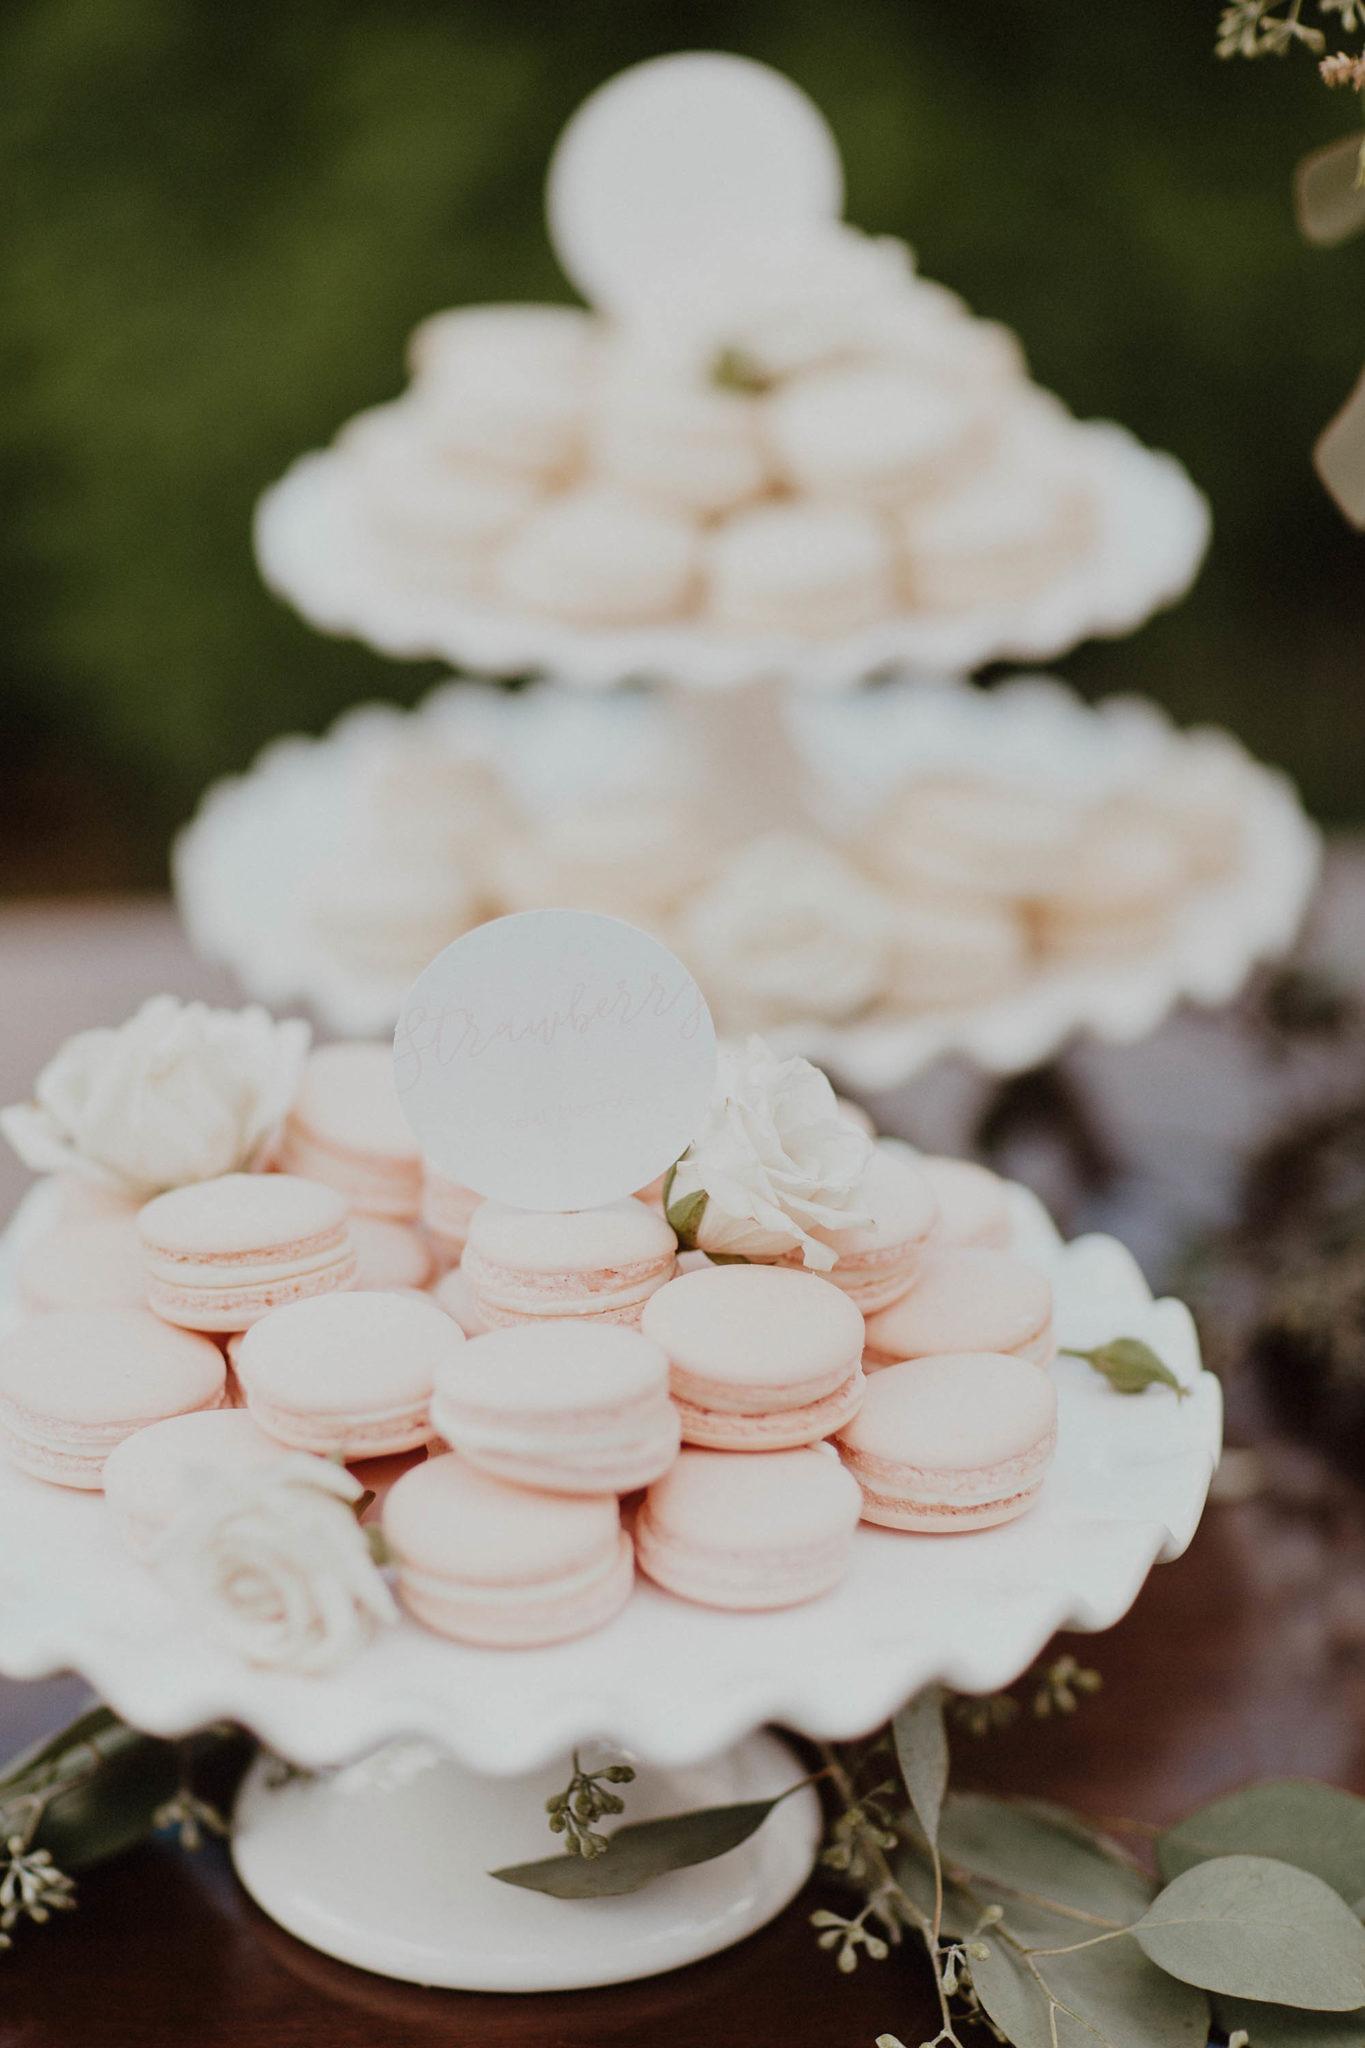 Dessert table blush and white french macarons for wedding on north shore kauai hawaiii